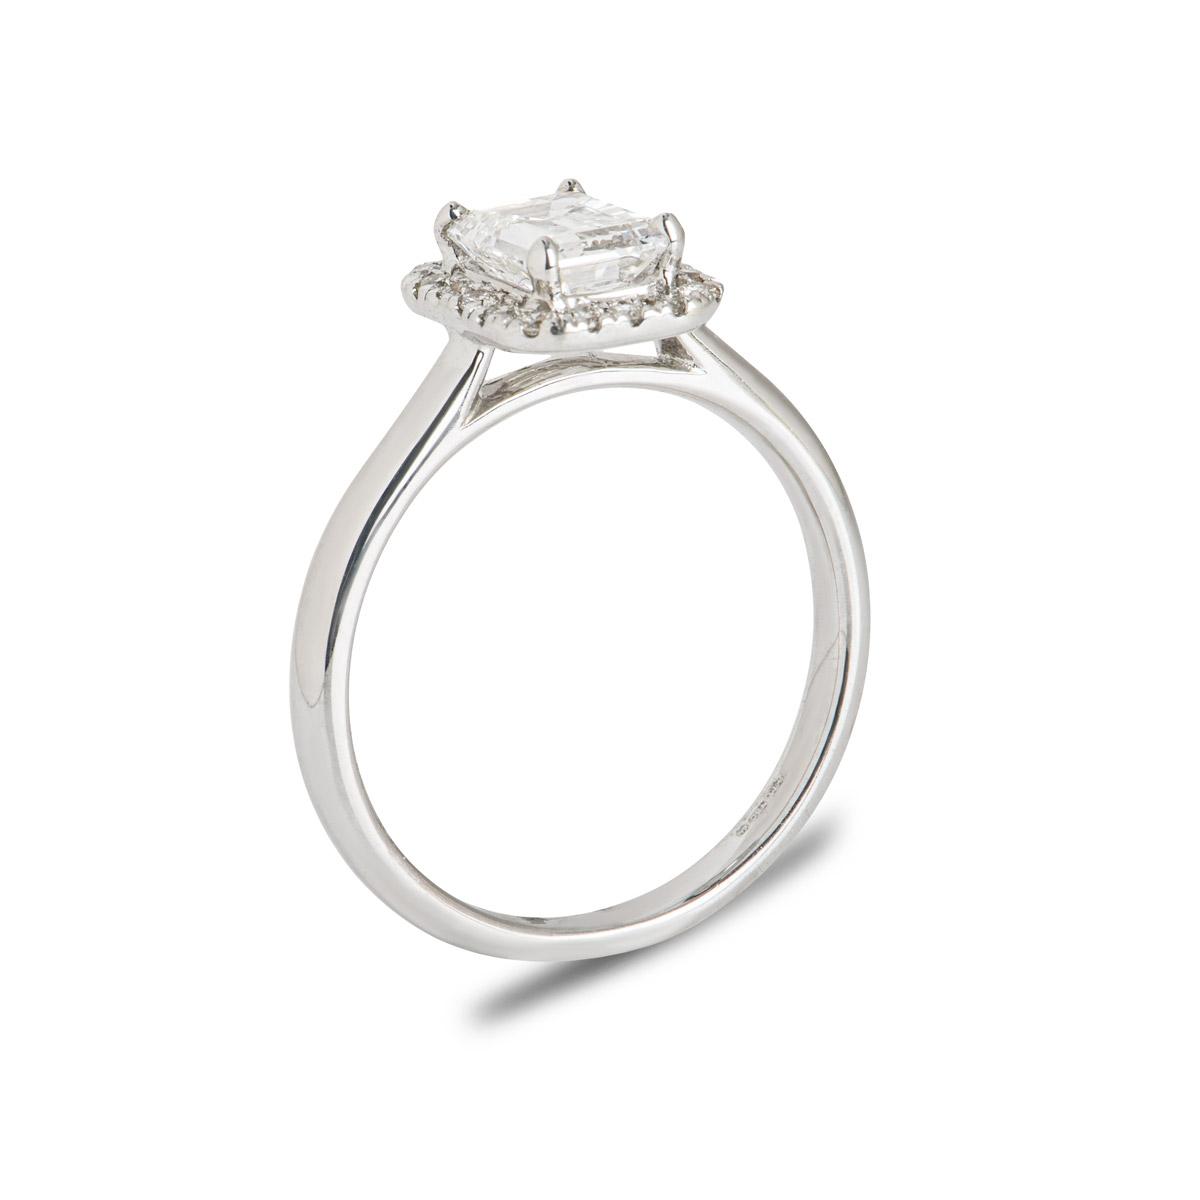 18k White Gold Emerald Cut Diamond Ring 1.07ct F/IF